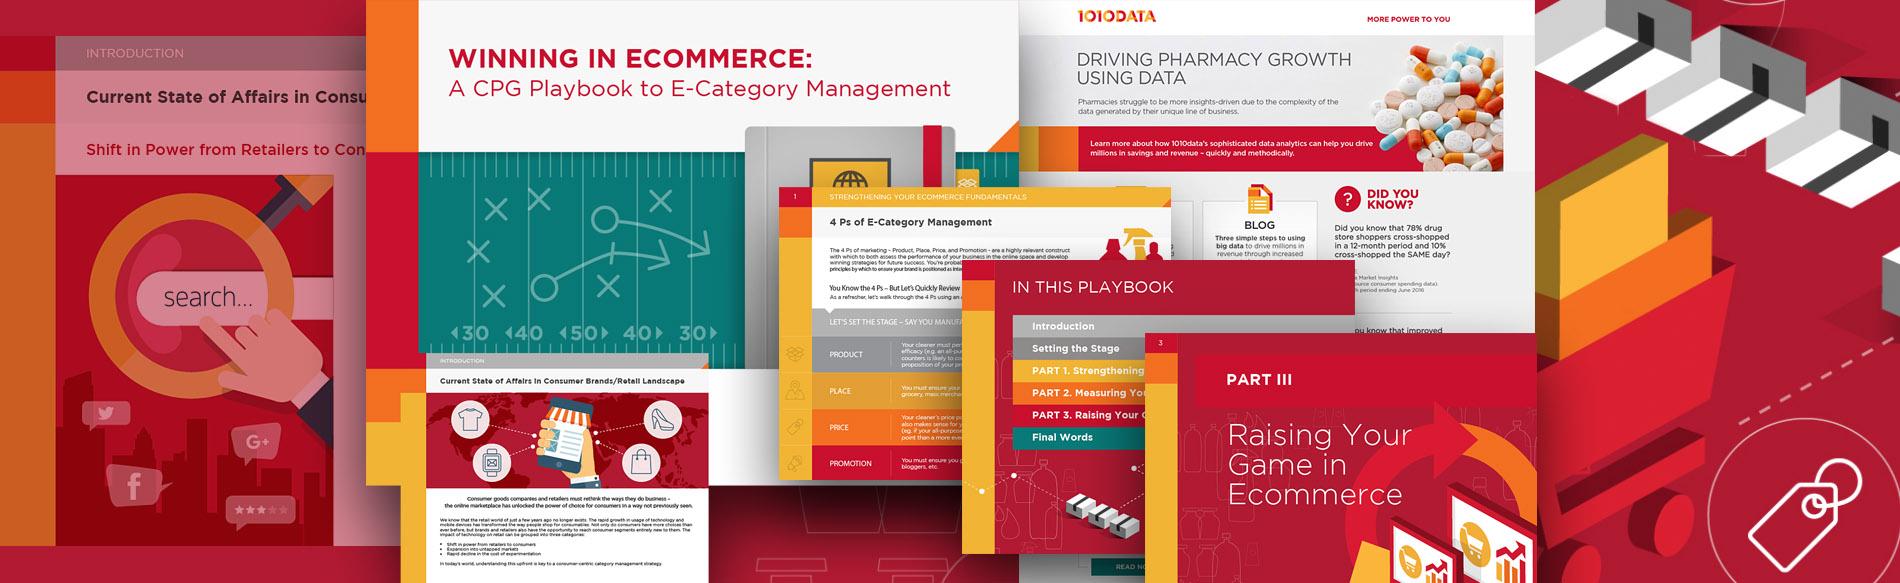 Online Marketing Lead Generation Landing Pages Design